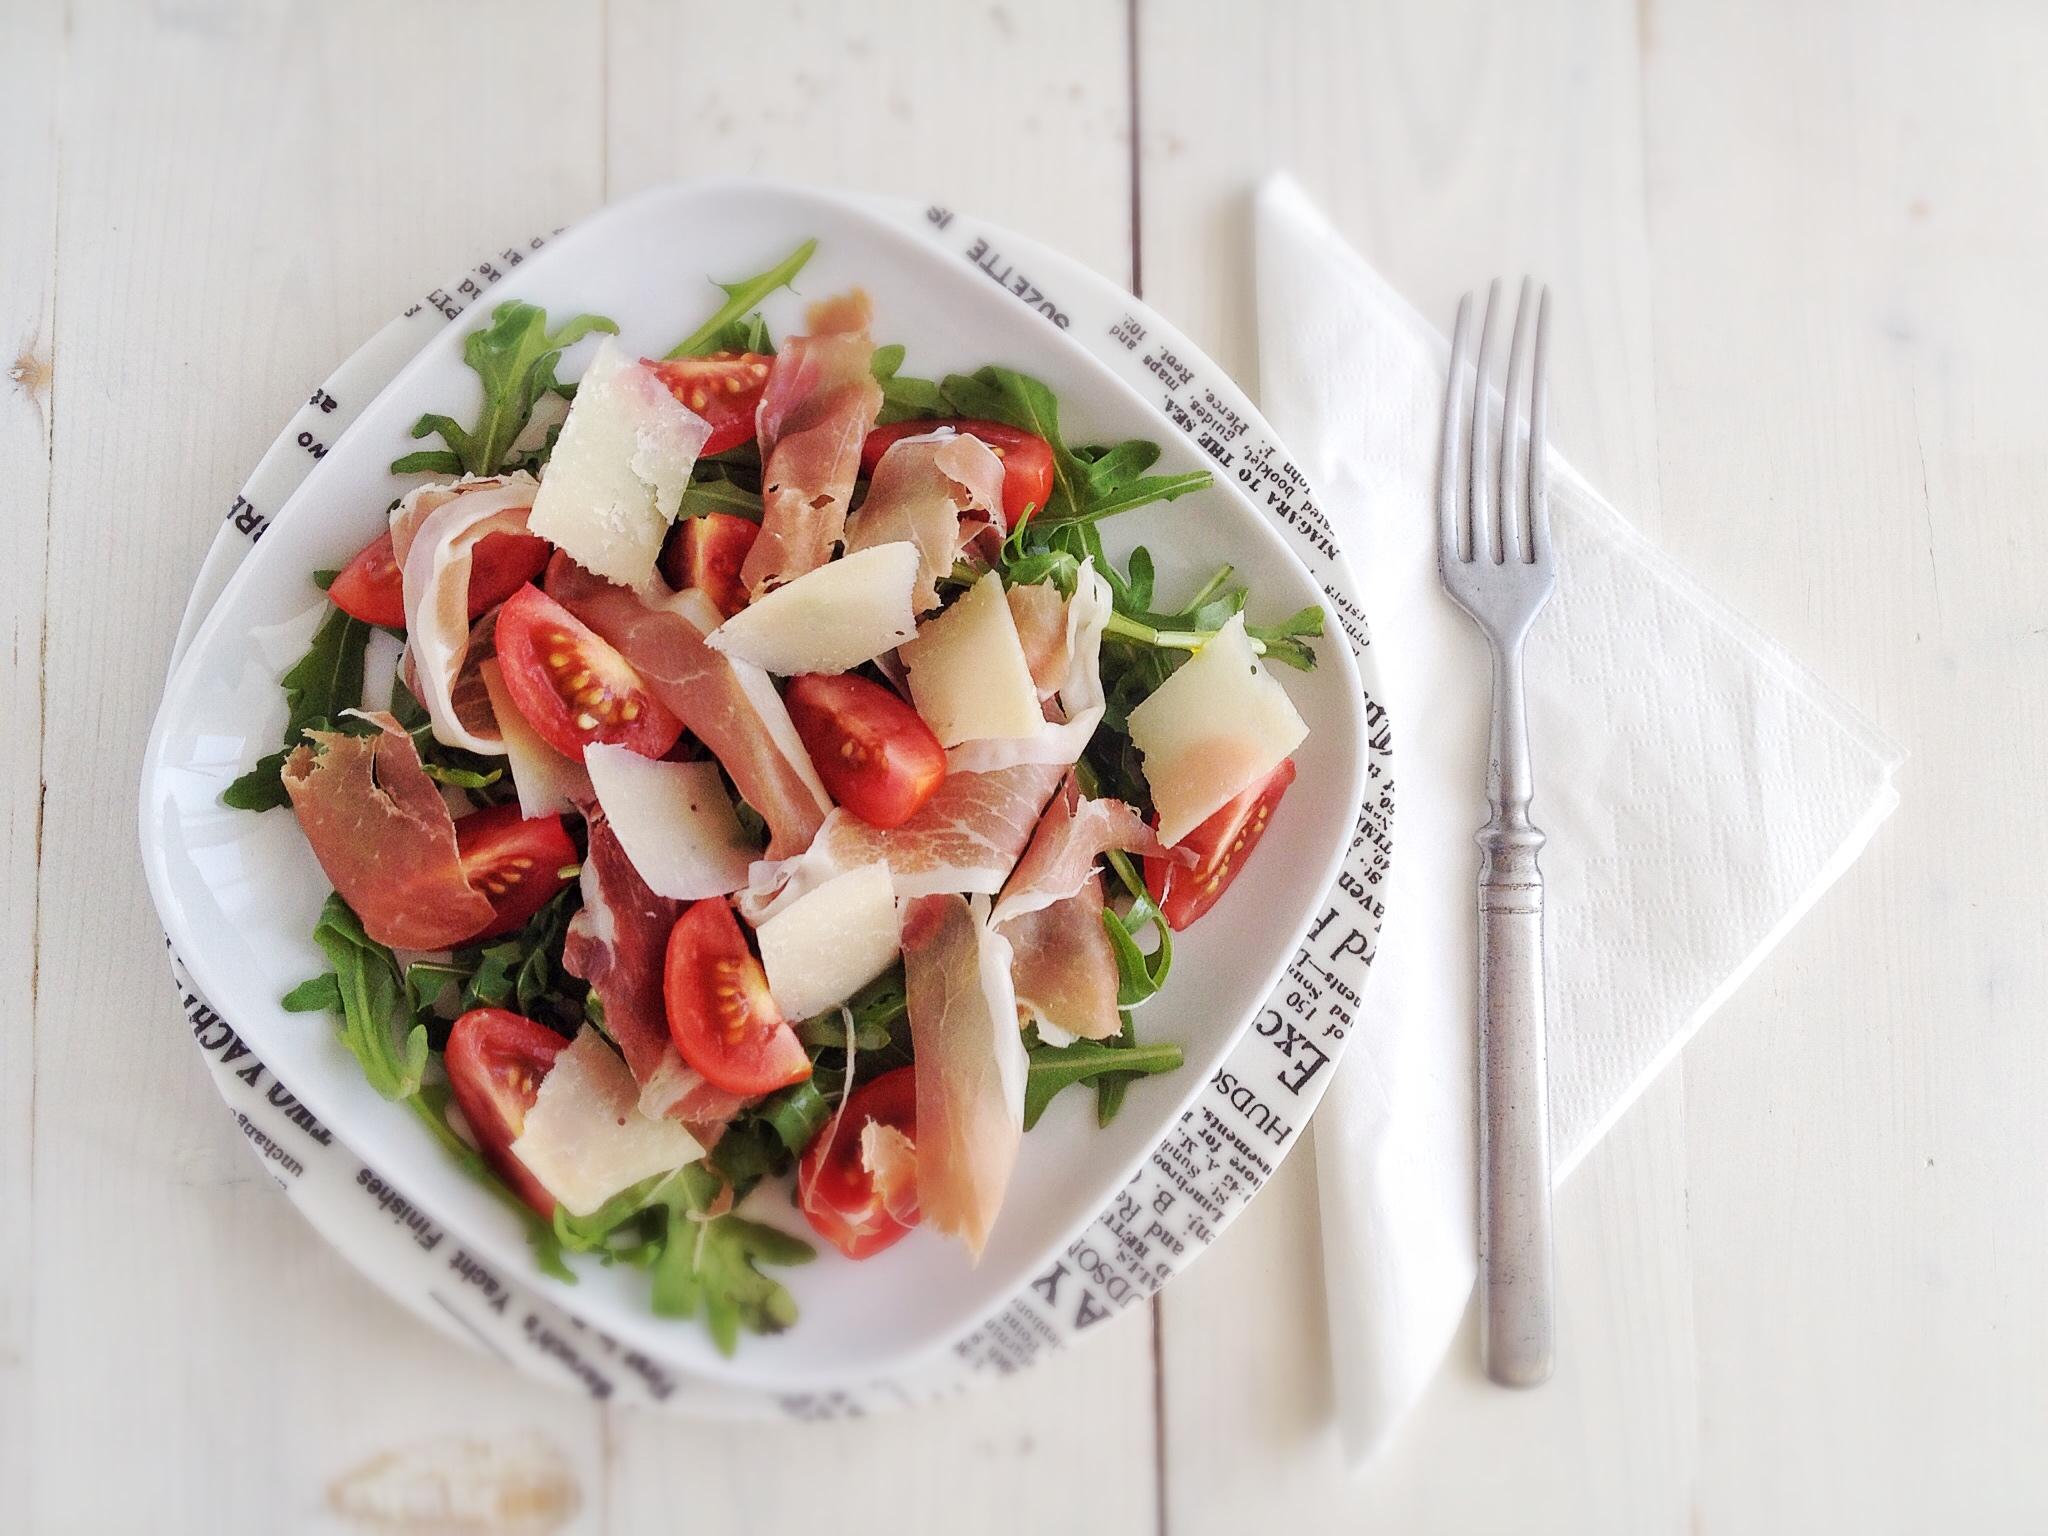 rukkolas-salata-prosciuttoval-5-hozzavalobol.JPG